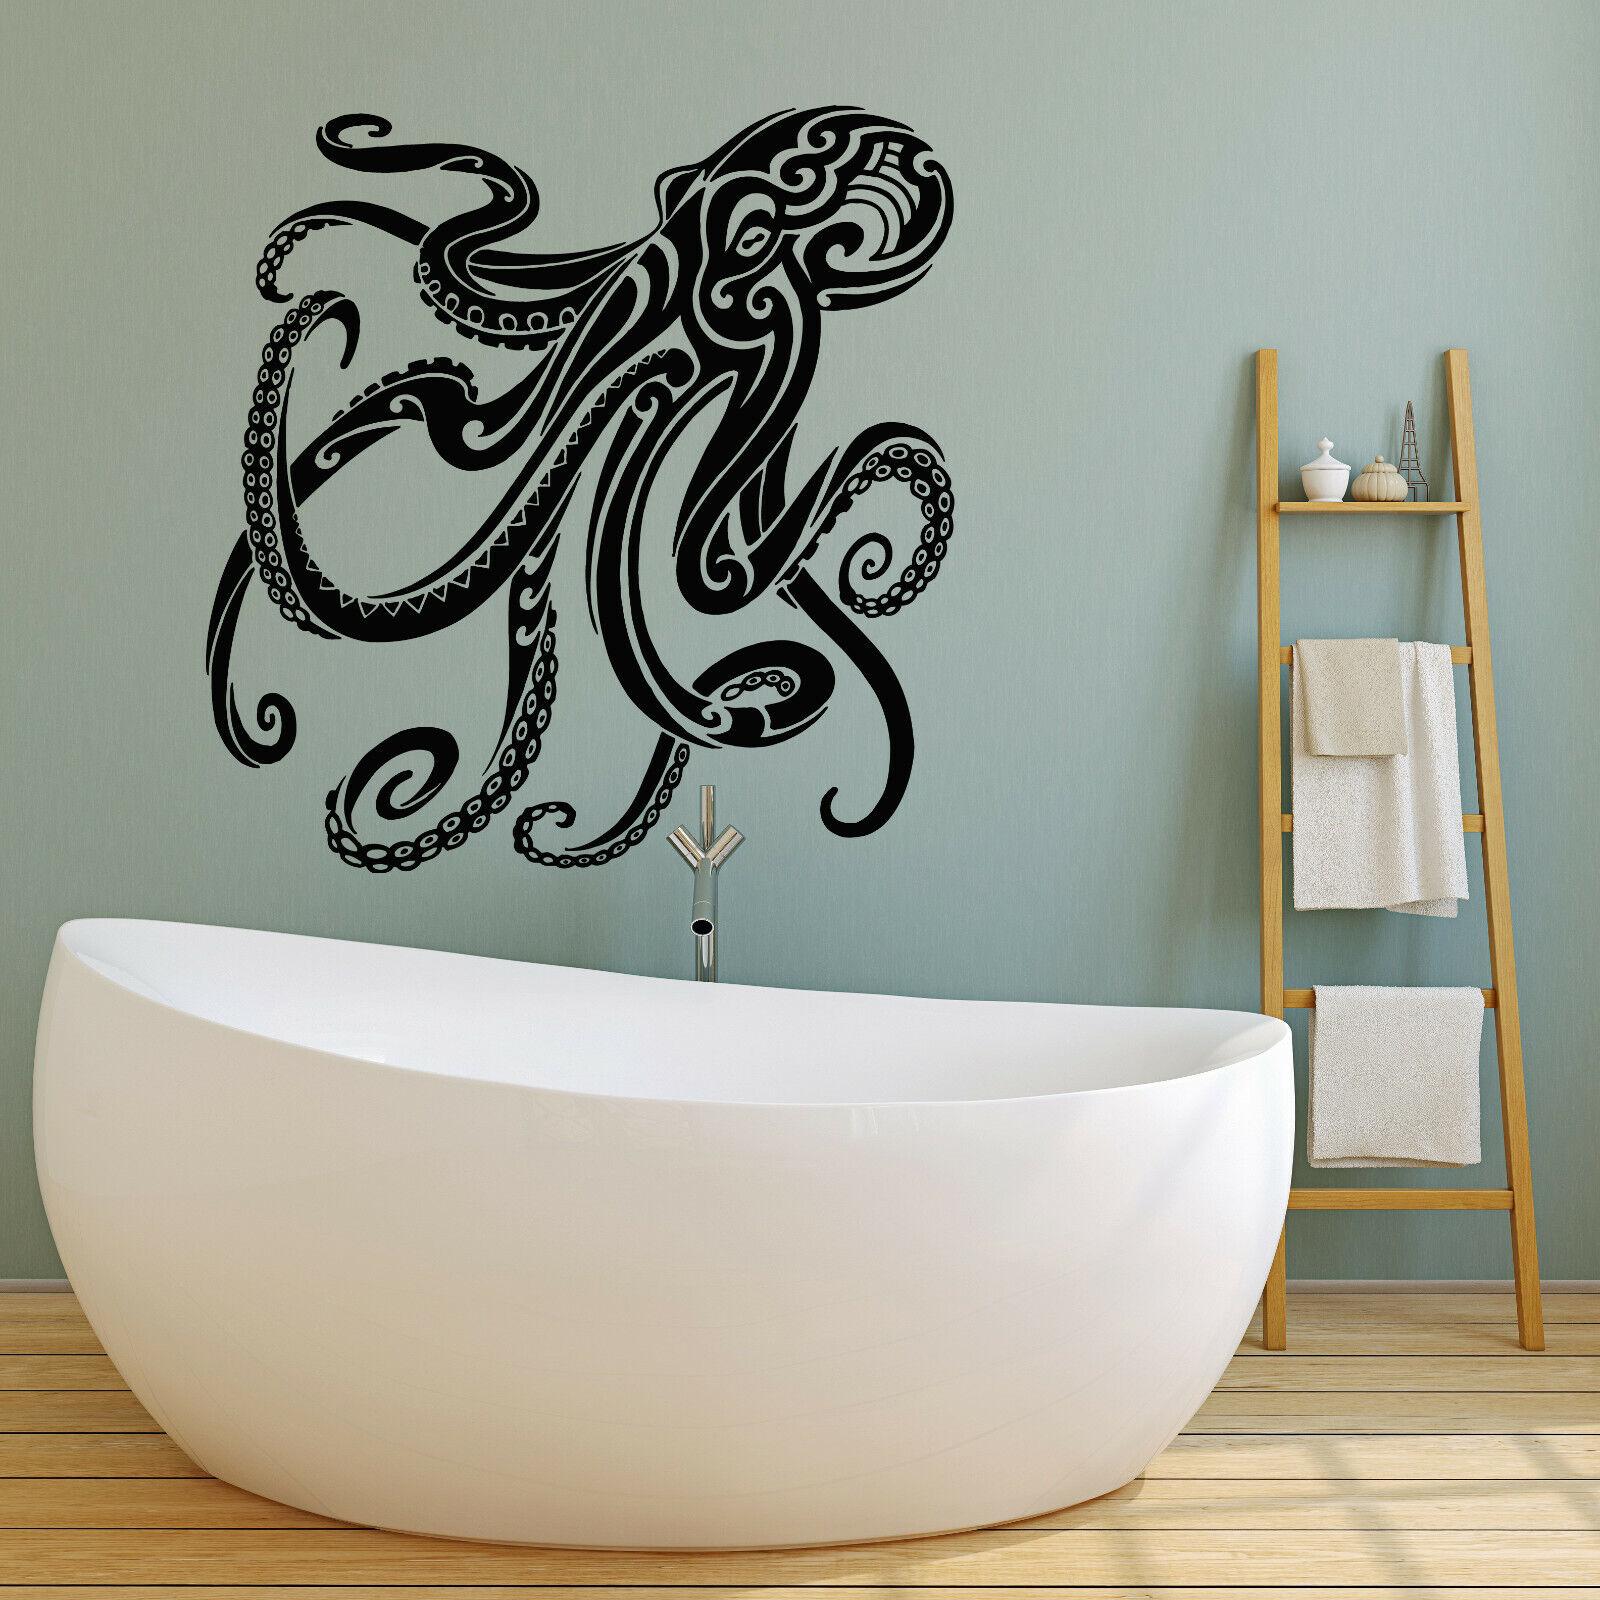 Vinyl Wall Decal Nautical Animal Octopus Ocean Marine Sea St